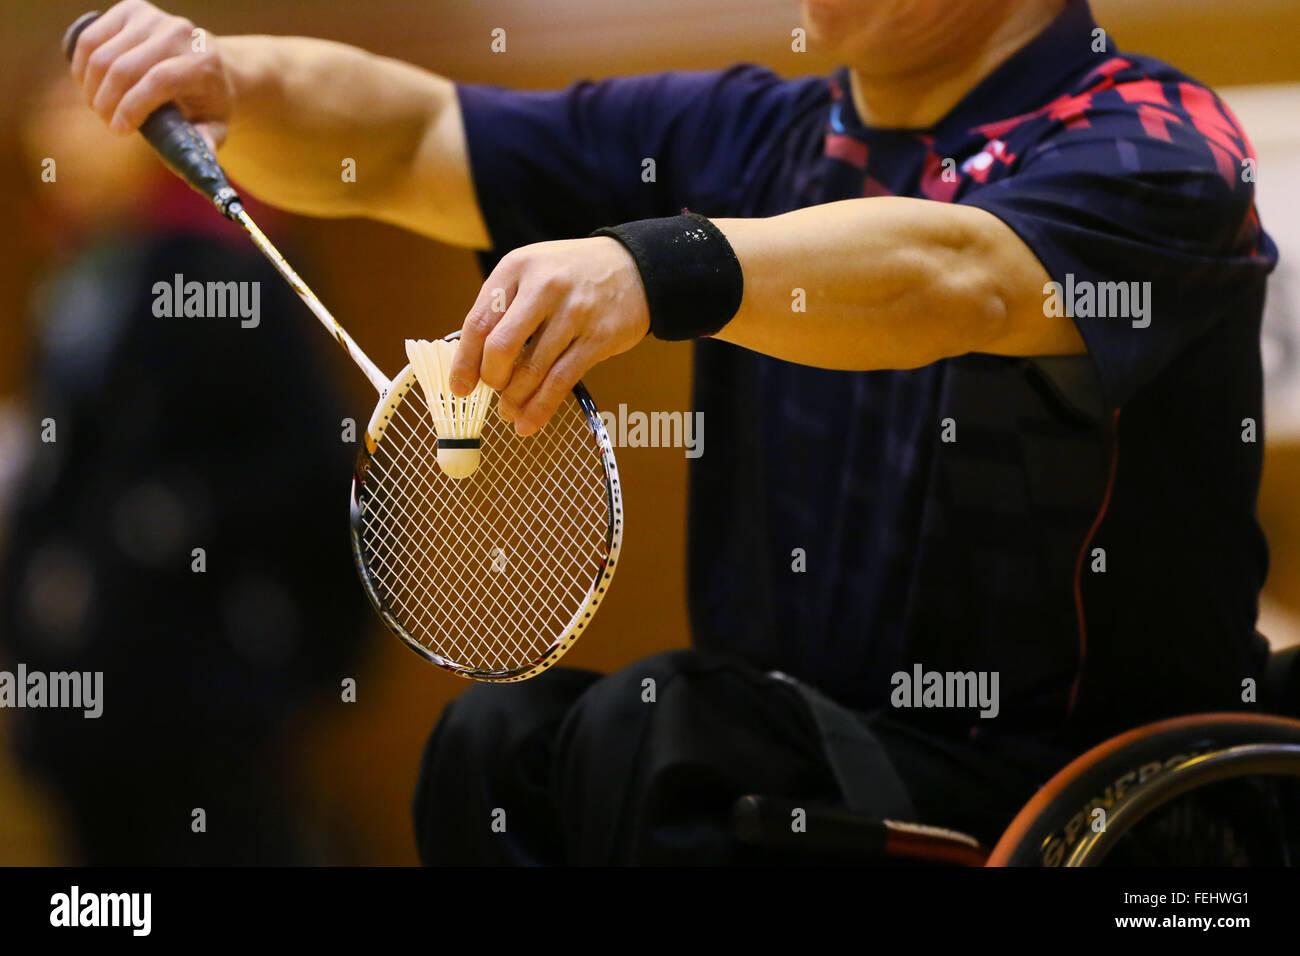 Kurume City western palestra, Fukuoka, Giappone. 6 febbraio, 2016. Dettaglio shot, 6 febbraio 2016 - Badminton : Immagini Stock